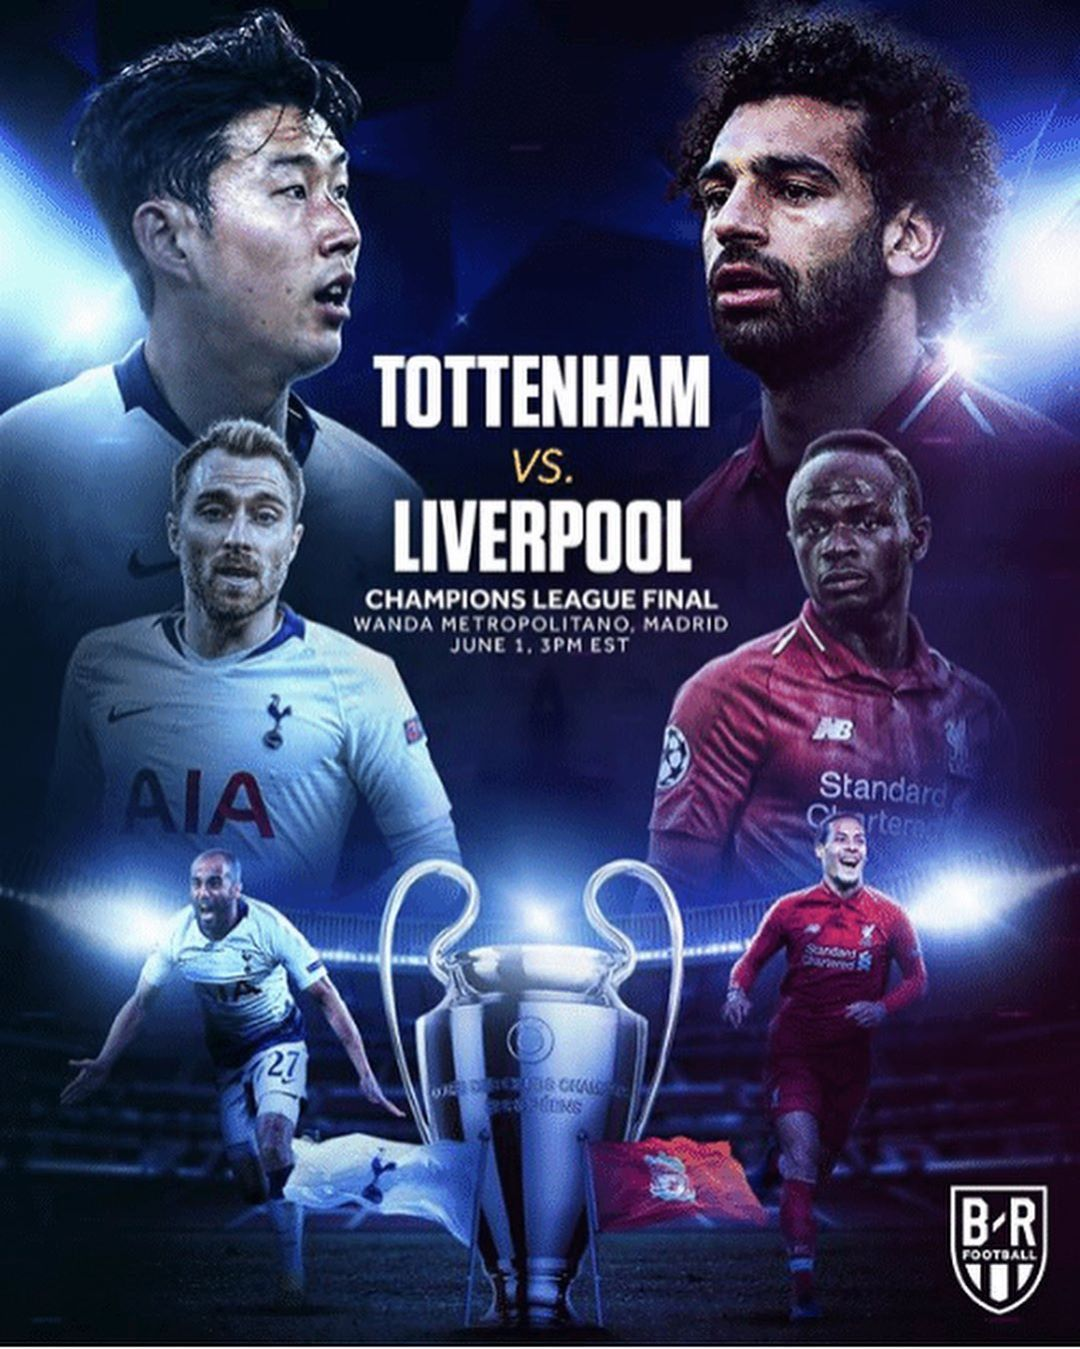 Uefa 챔피언스리그 결승전 중계 안내 3공단 비어하우스에서 오는 6월 2일 새벽 4시 챔피언스리그 중계방송에 맞춰 연장 영업합니다 Liverpool Champions Champions League Final Liverpool Champions League Final